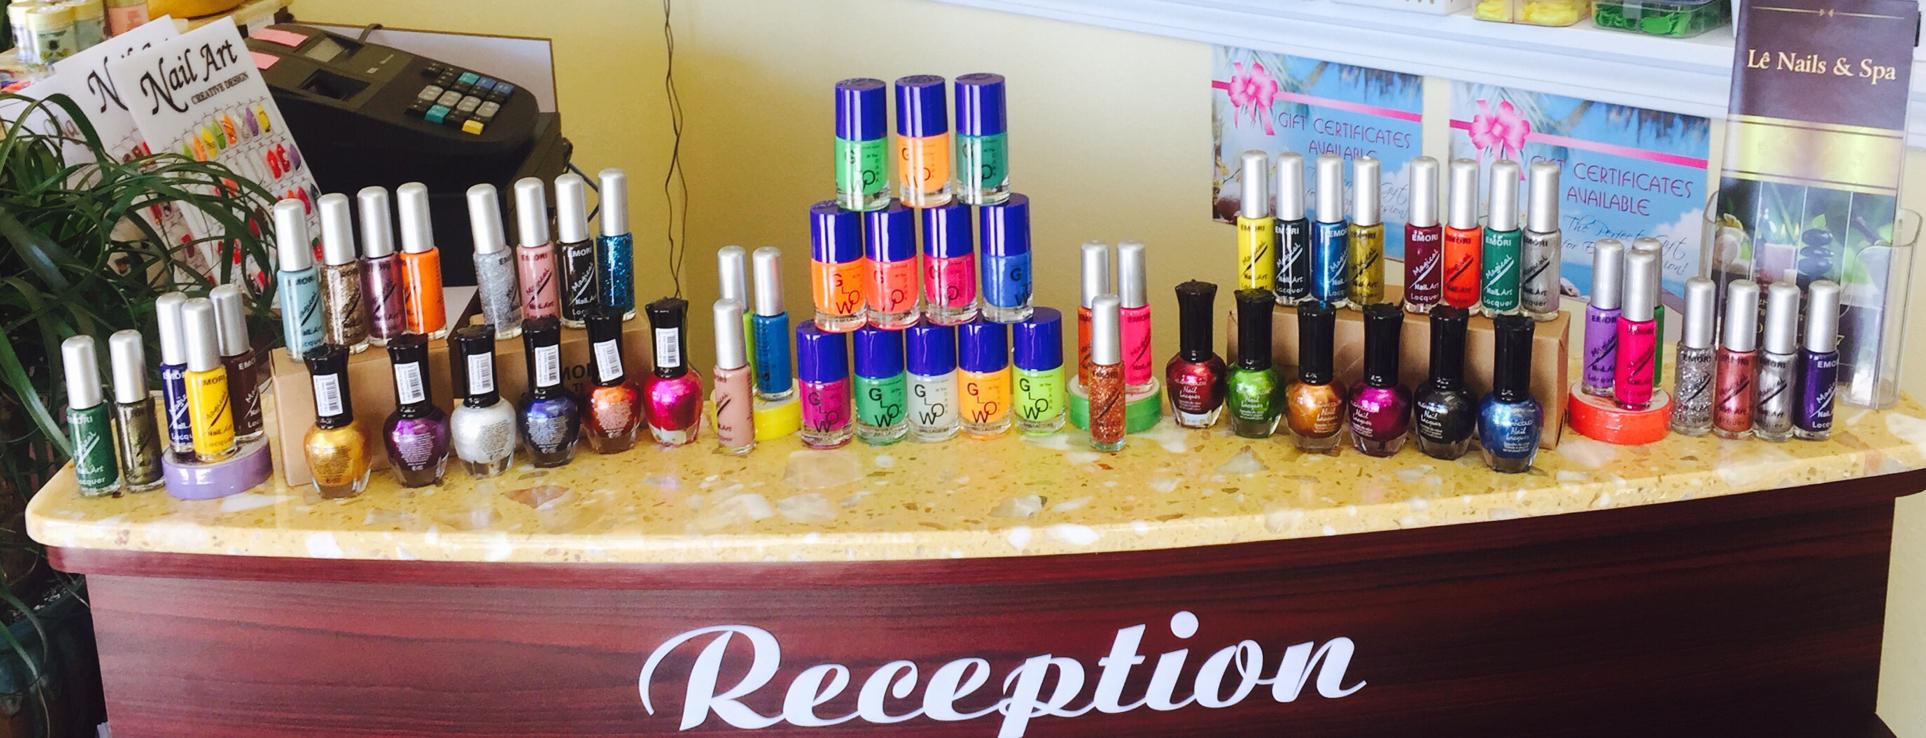 Le Nails & Spa 2128 W 9th Ave, Oshkosh, WI 54904 - YP.com